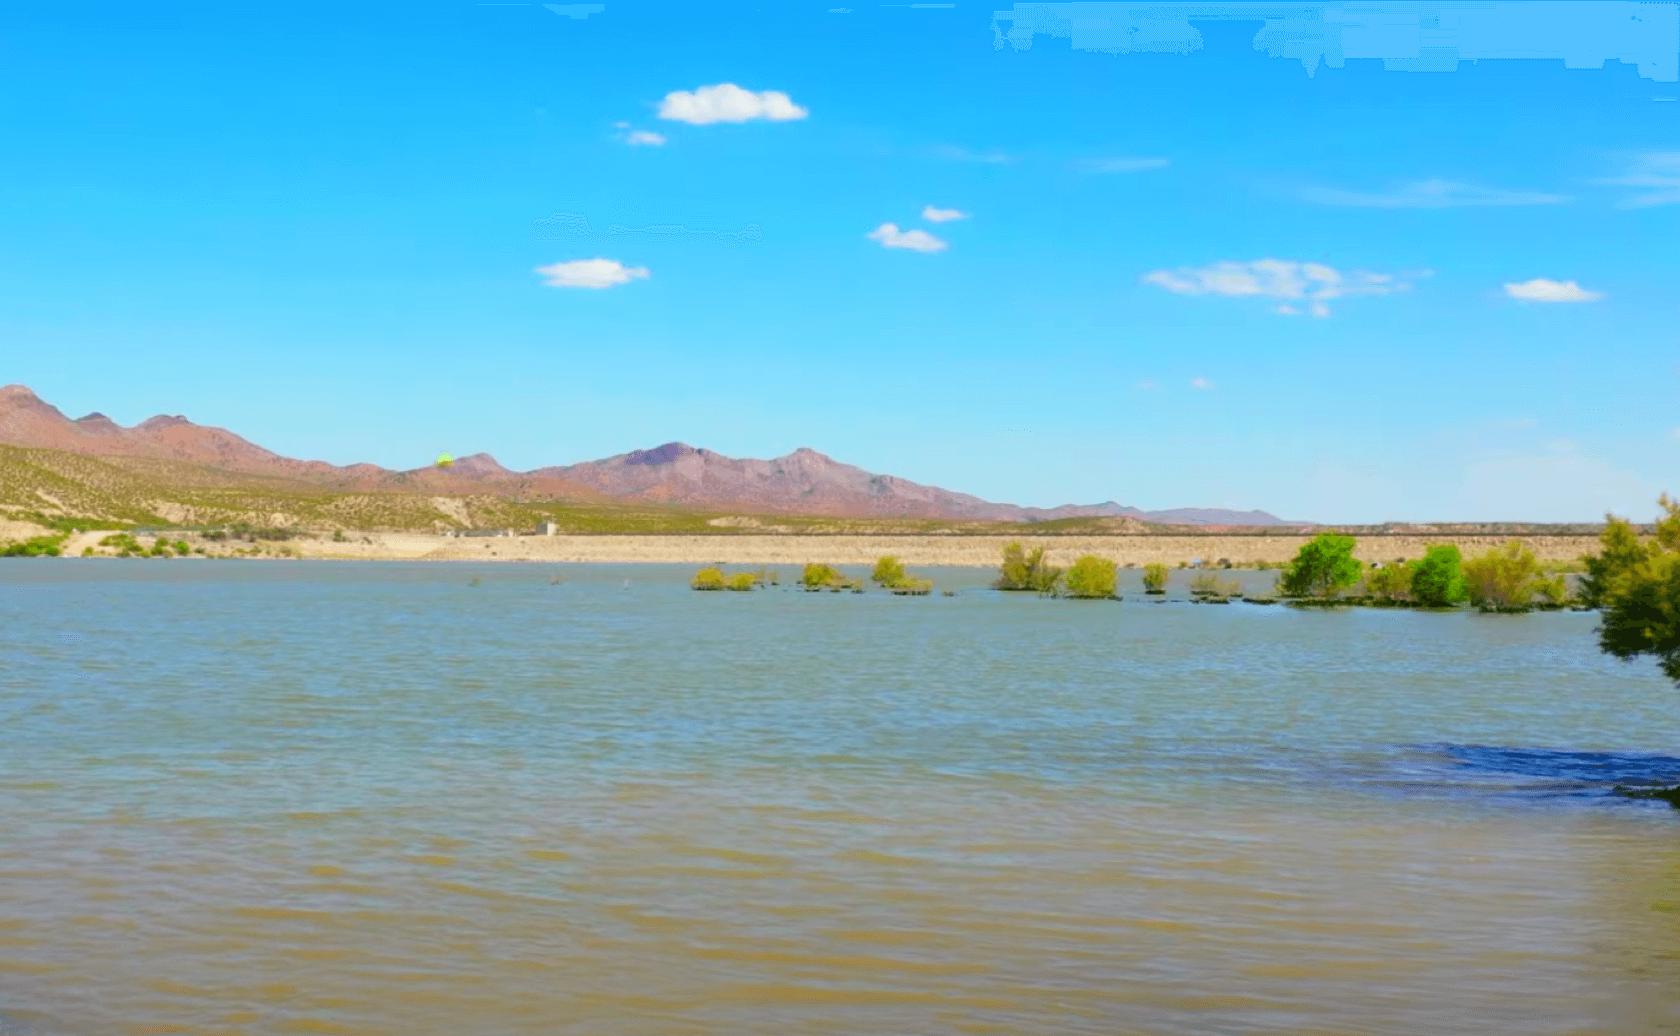 Caballo-Lake-Fishing-Guide-04-1